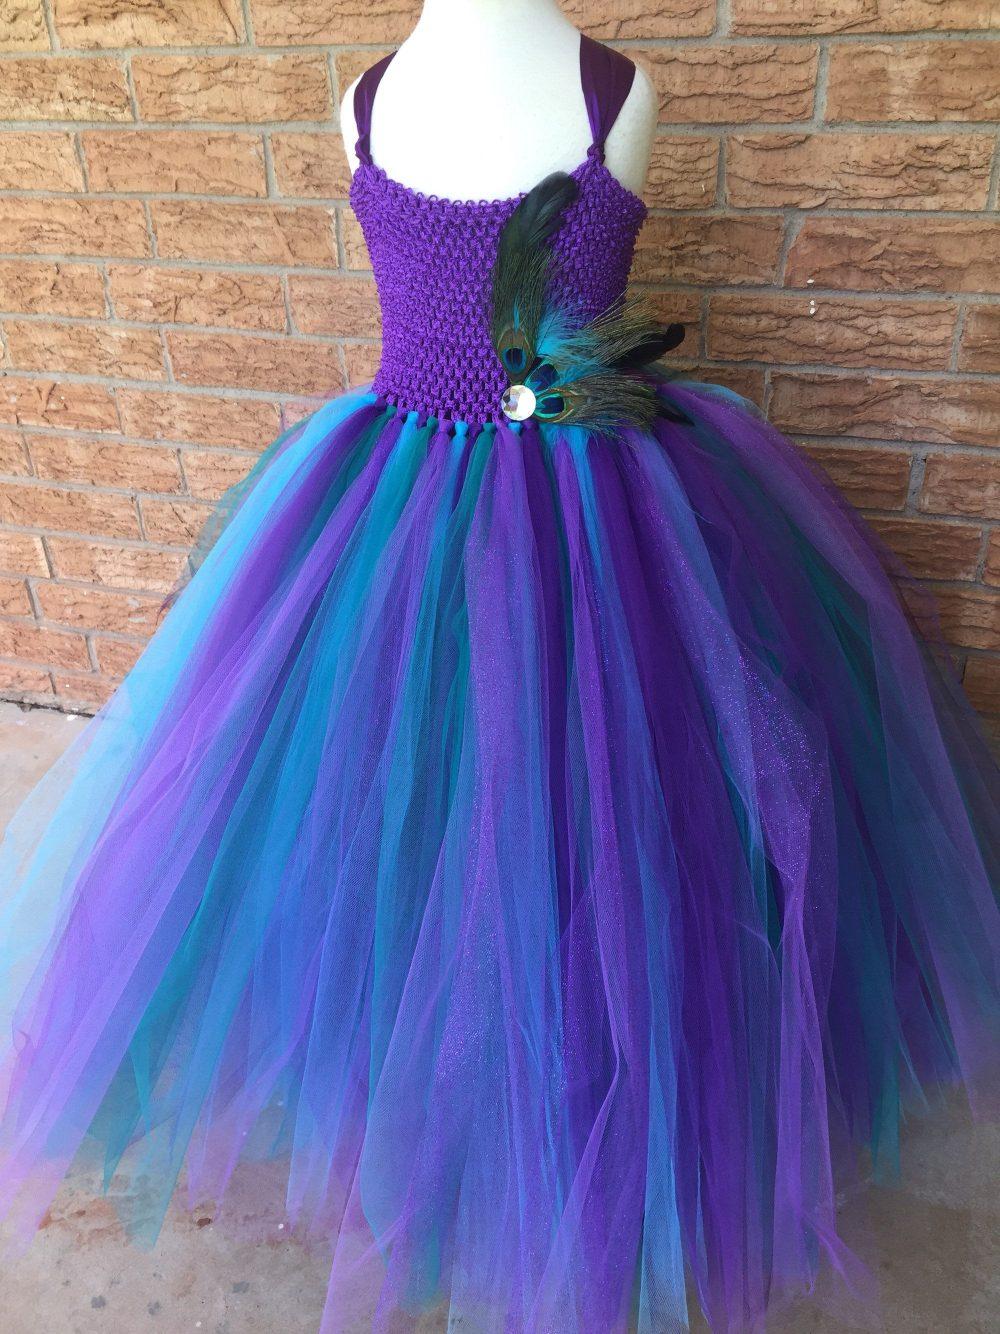 Purple Plum Peacock Wedding, Flower Girl Dress, Teal Tutu Tulle Peacock Theme